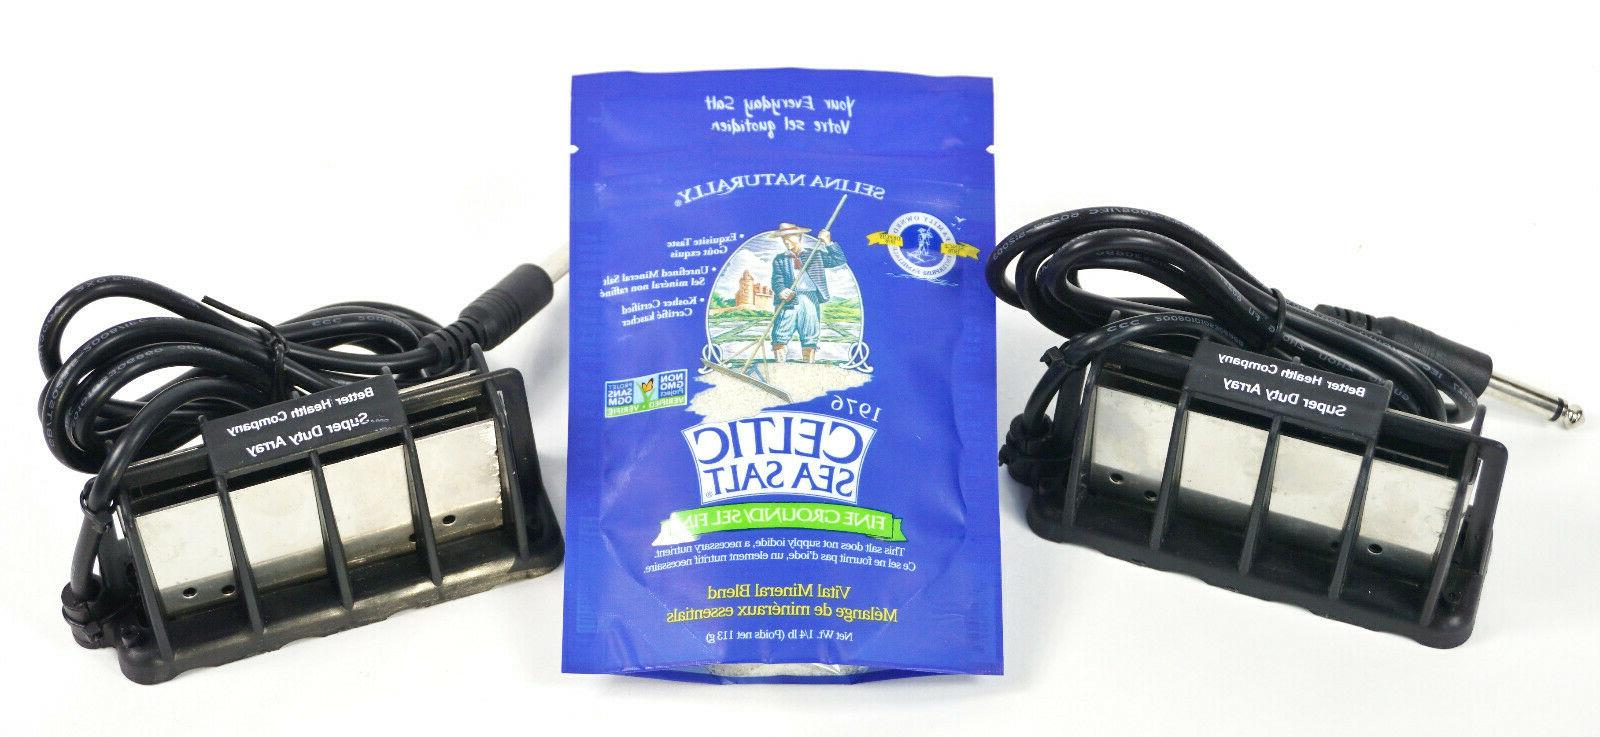 Blue Detox Spa Bath with 2 Arrays